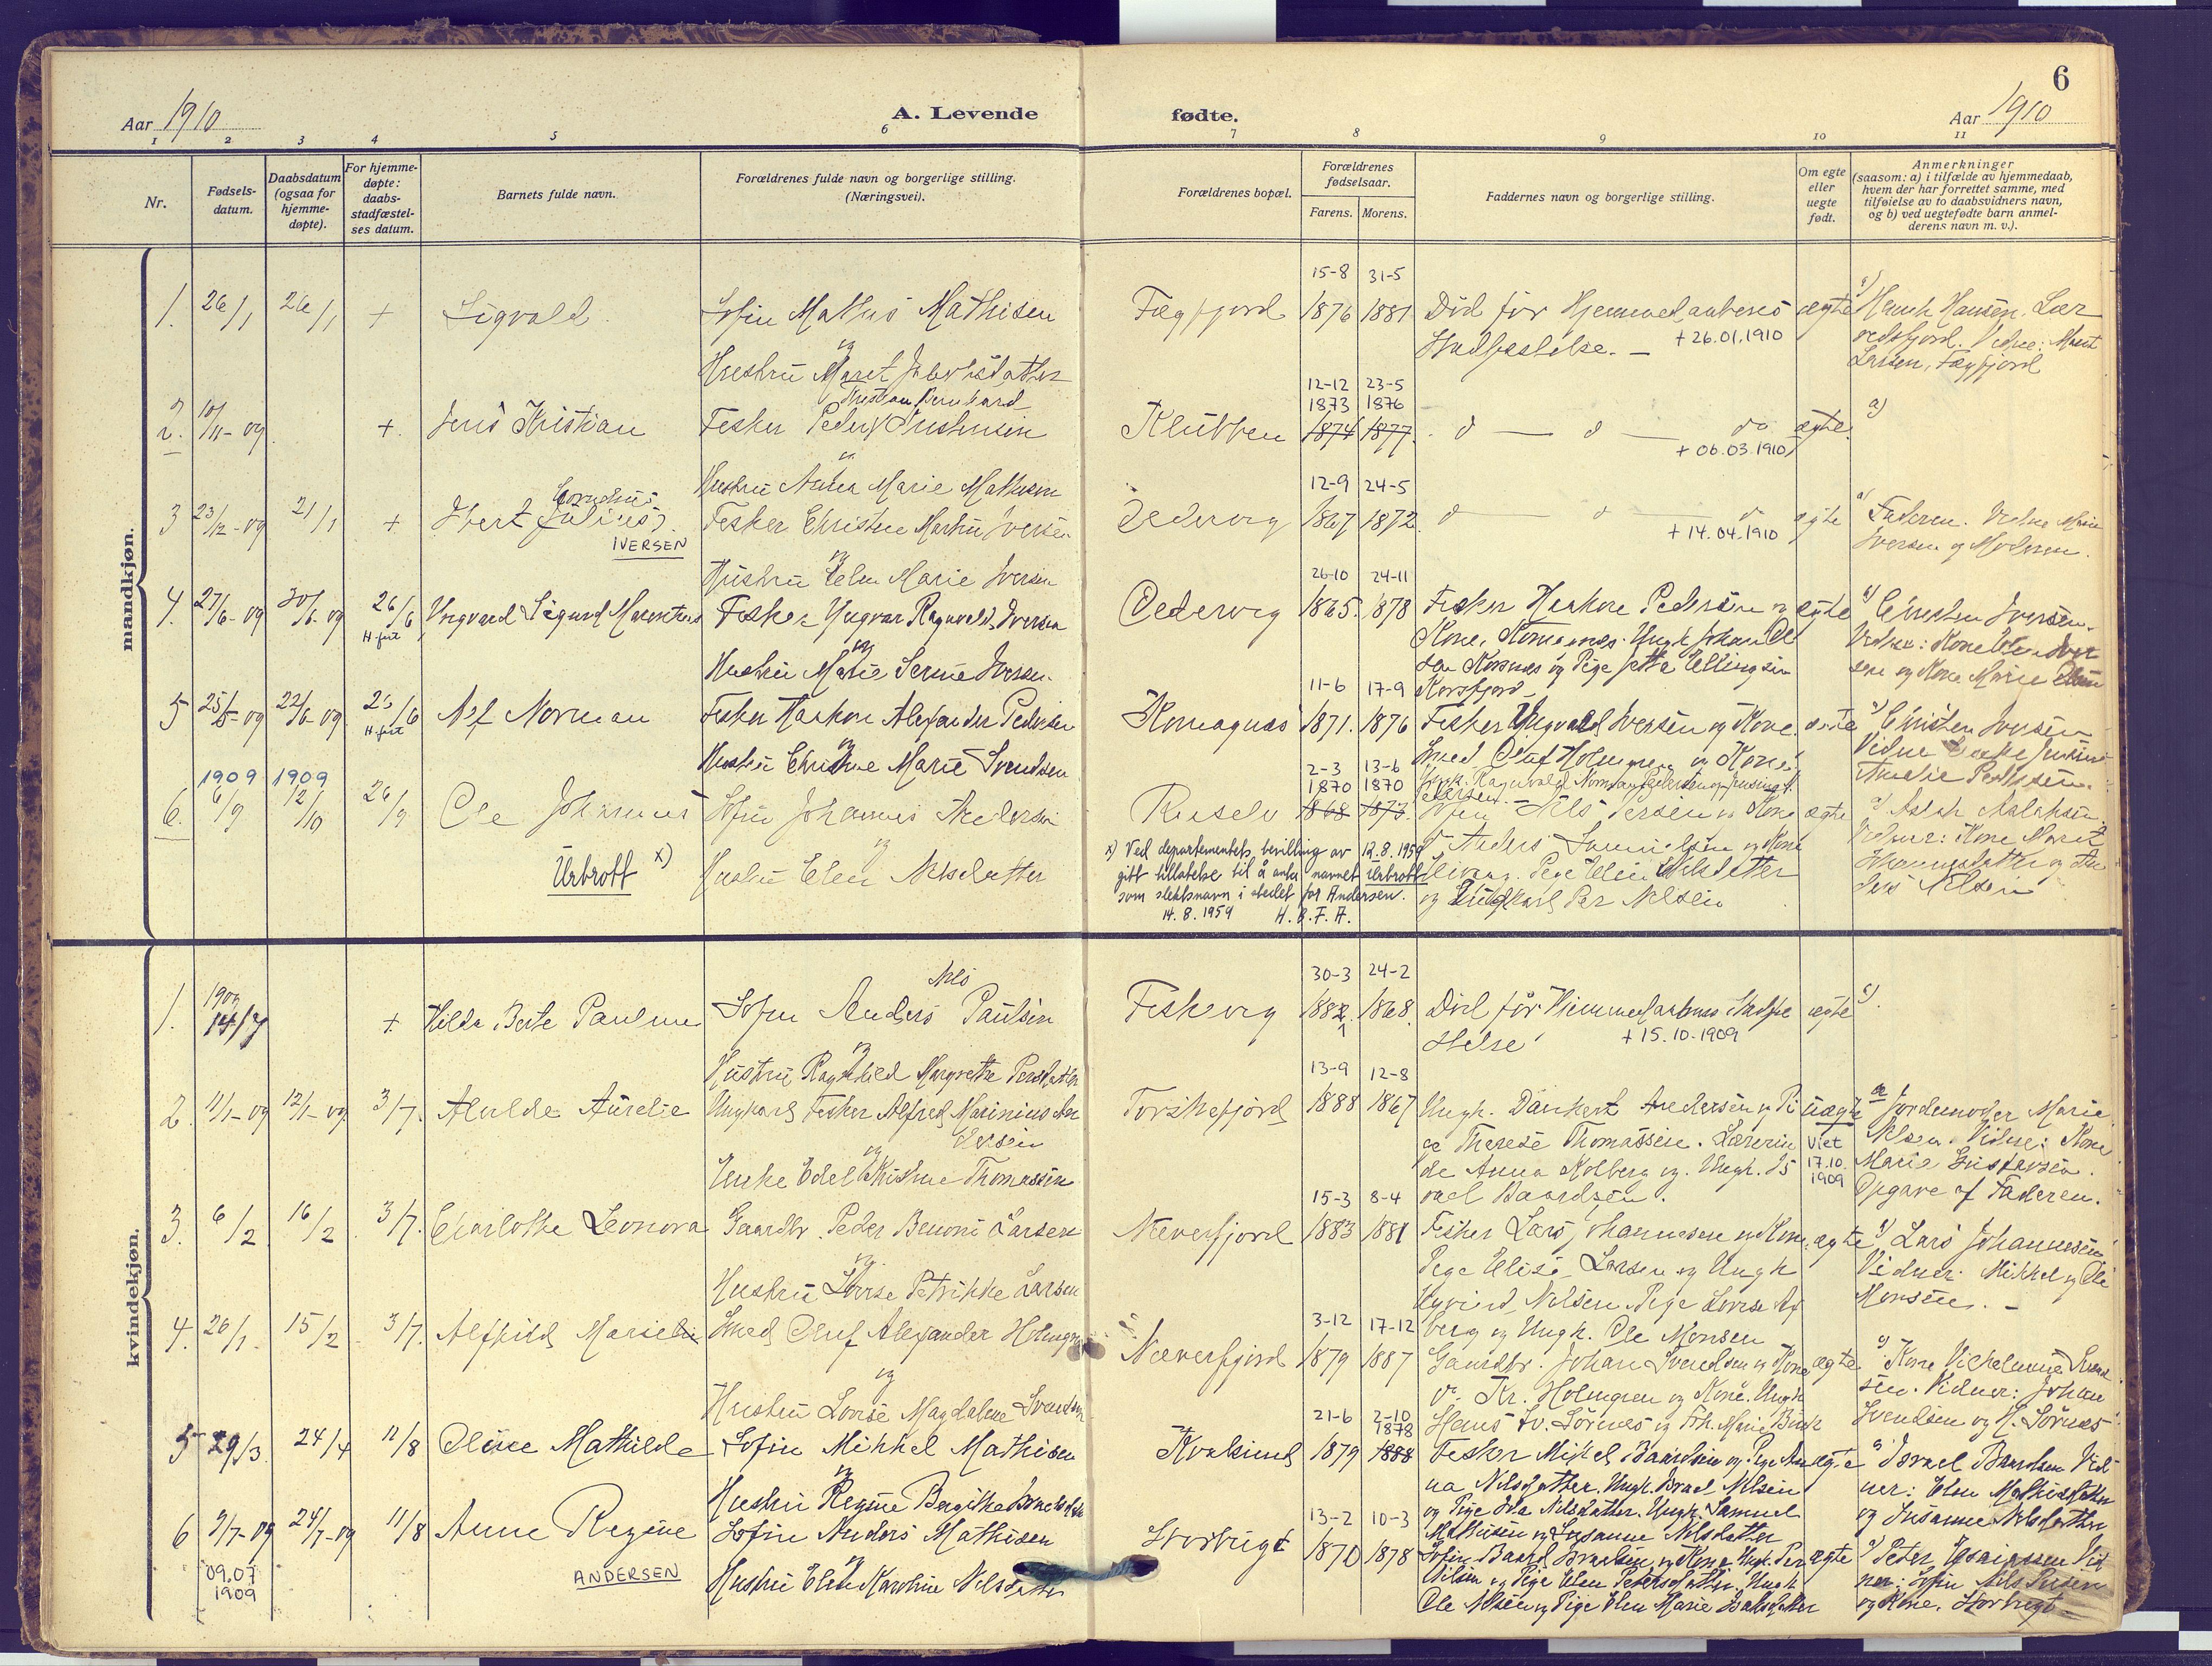 SATØ, Hammerfest sokneprestembete, Ministerialbok nr. 16, 1908-1923, s. 6